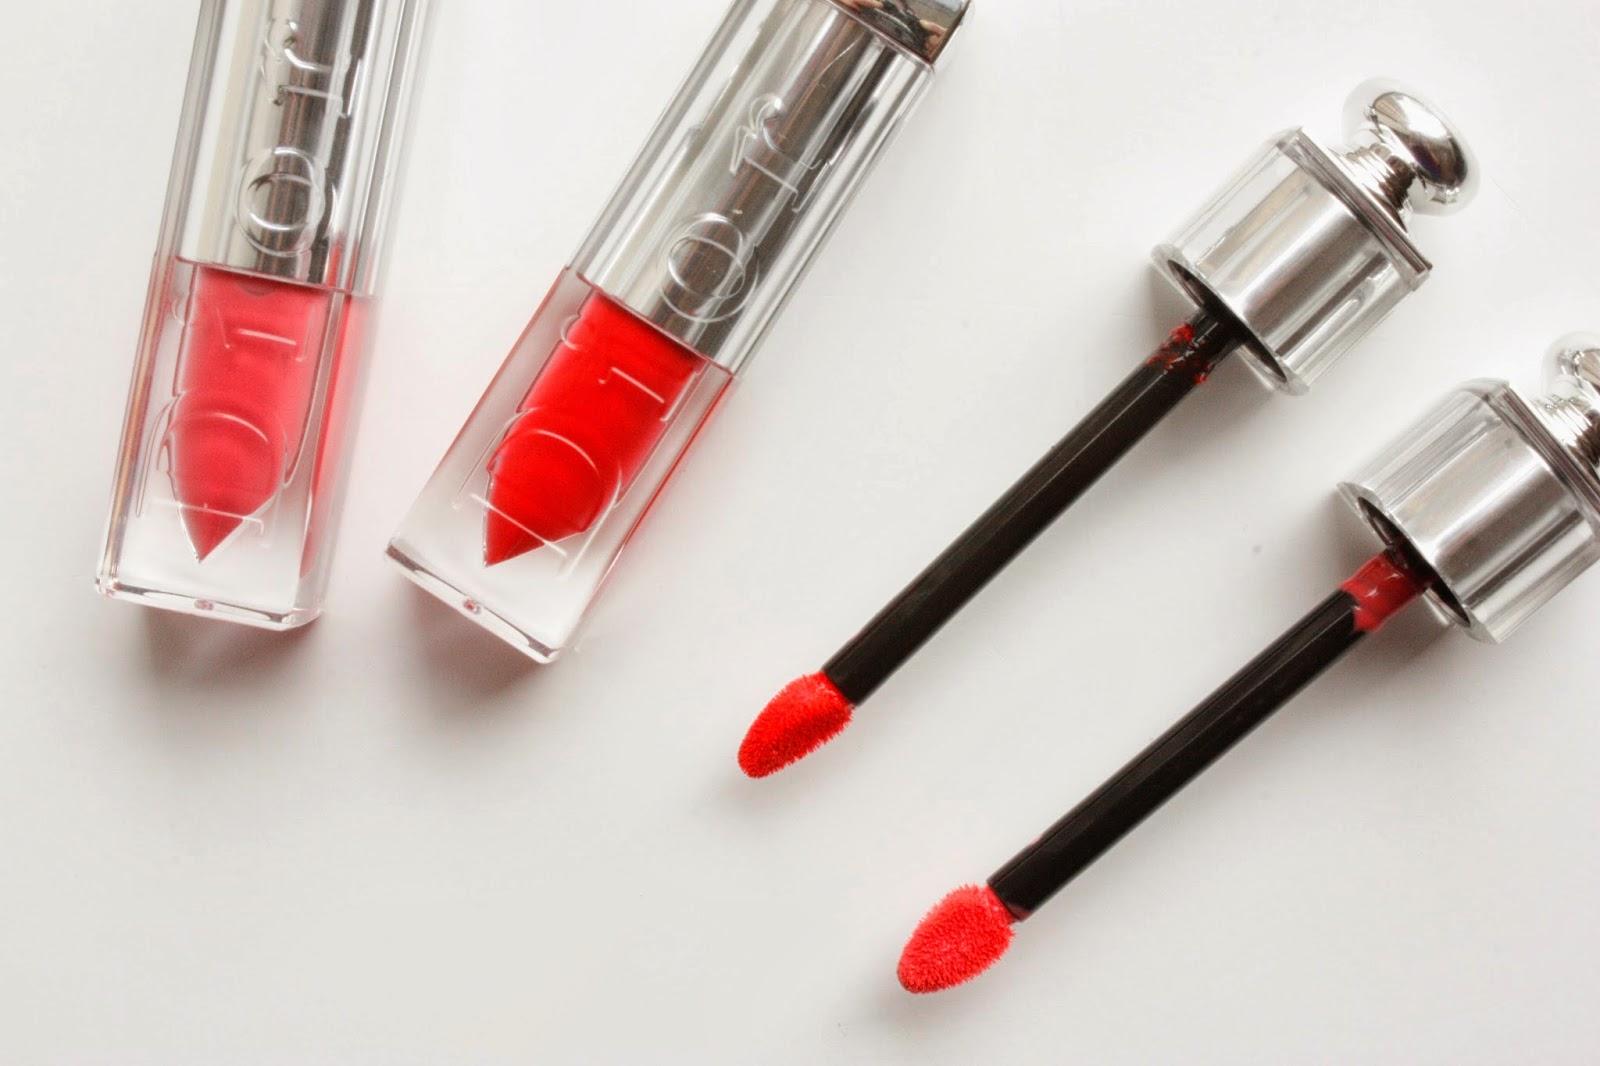 fd693dff New: Dior Addict Fluid Sticks - alittlebitetc